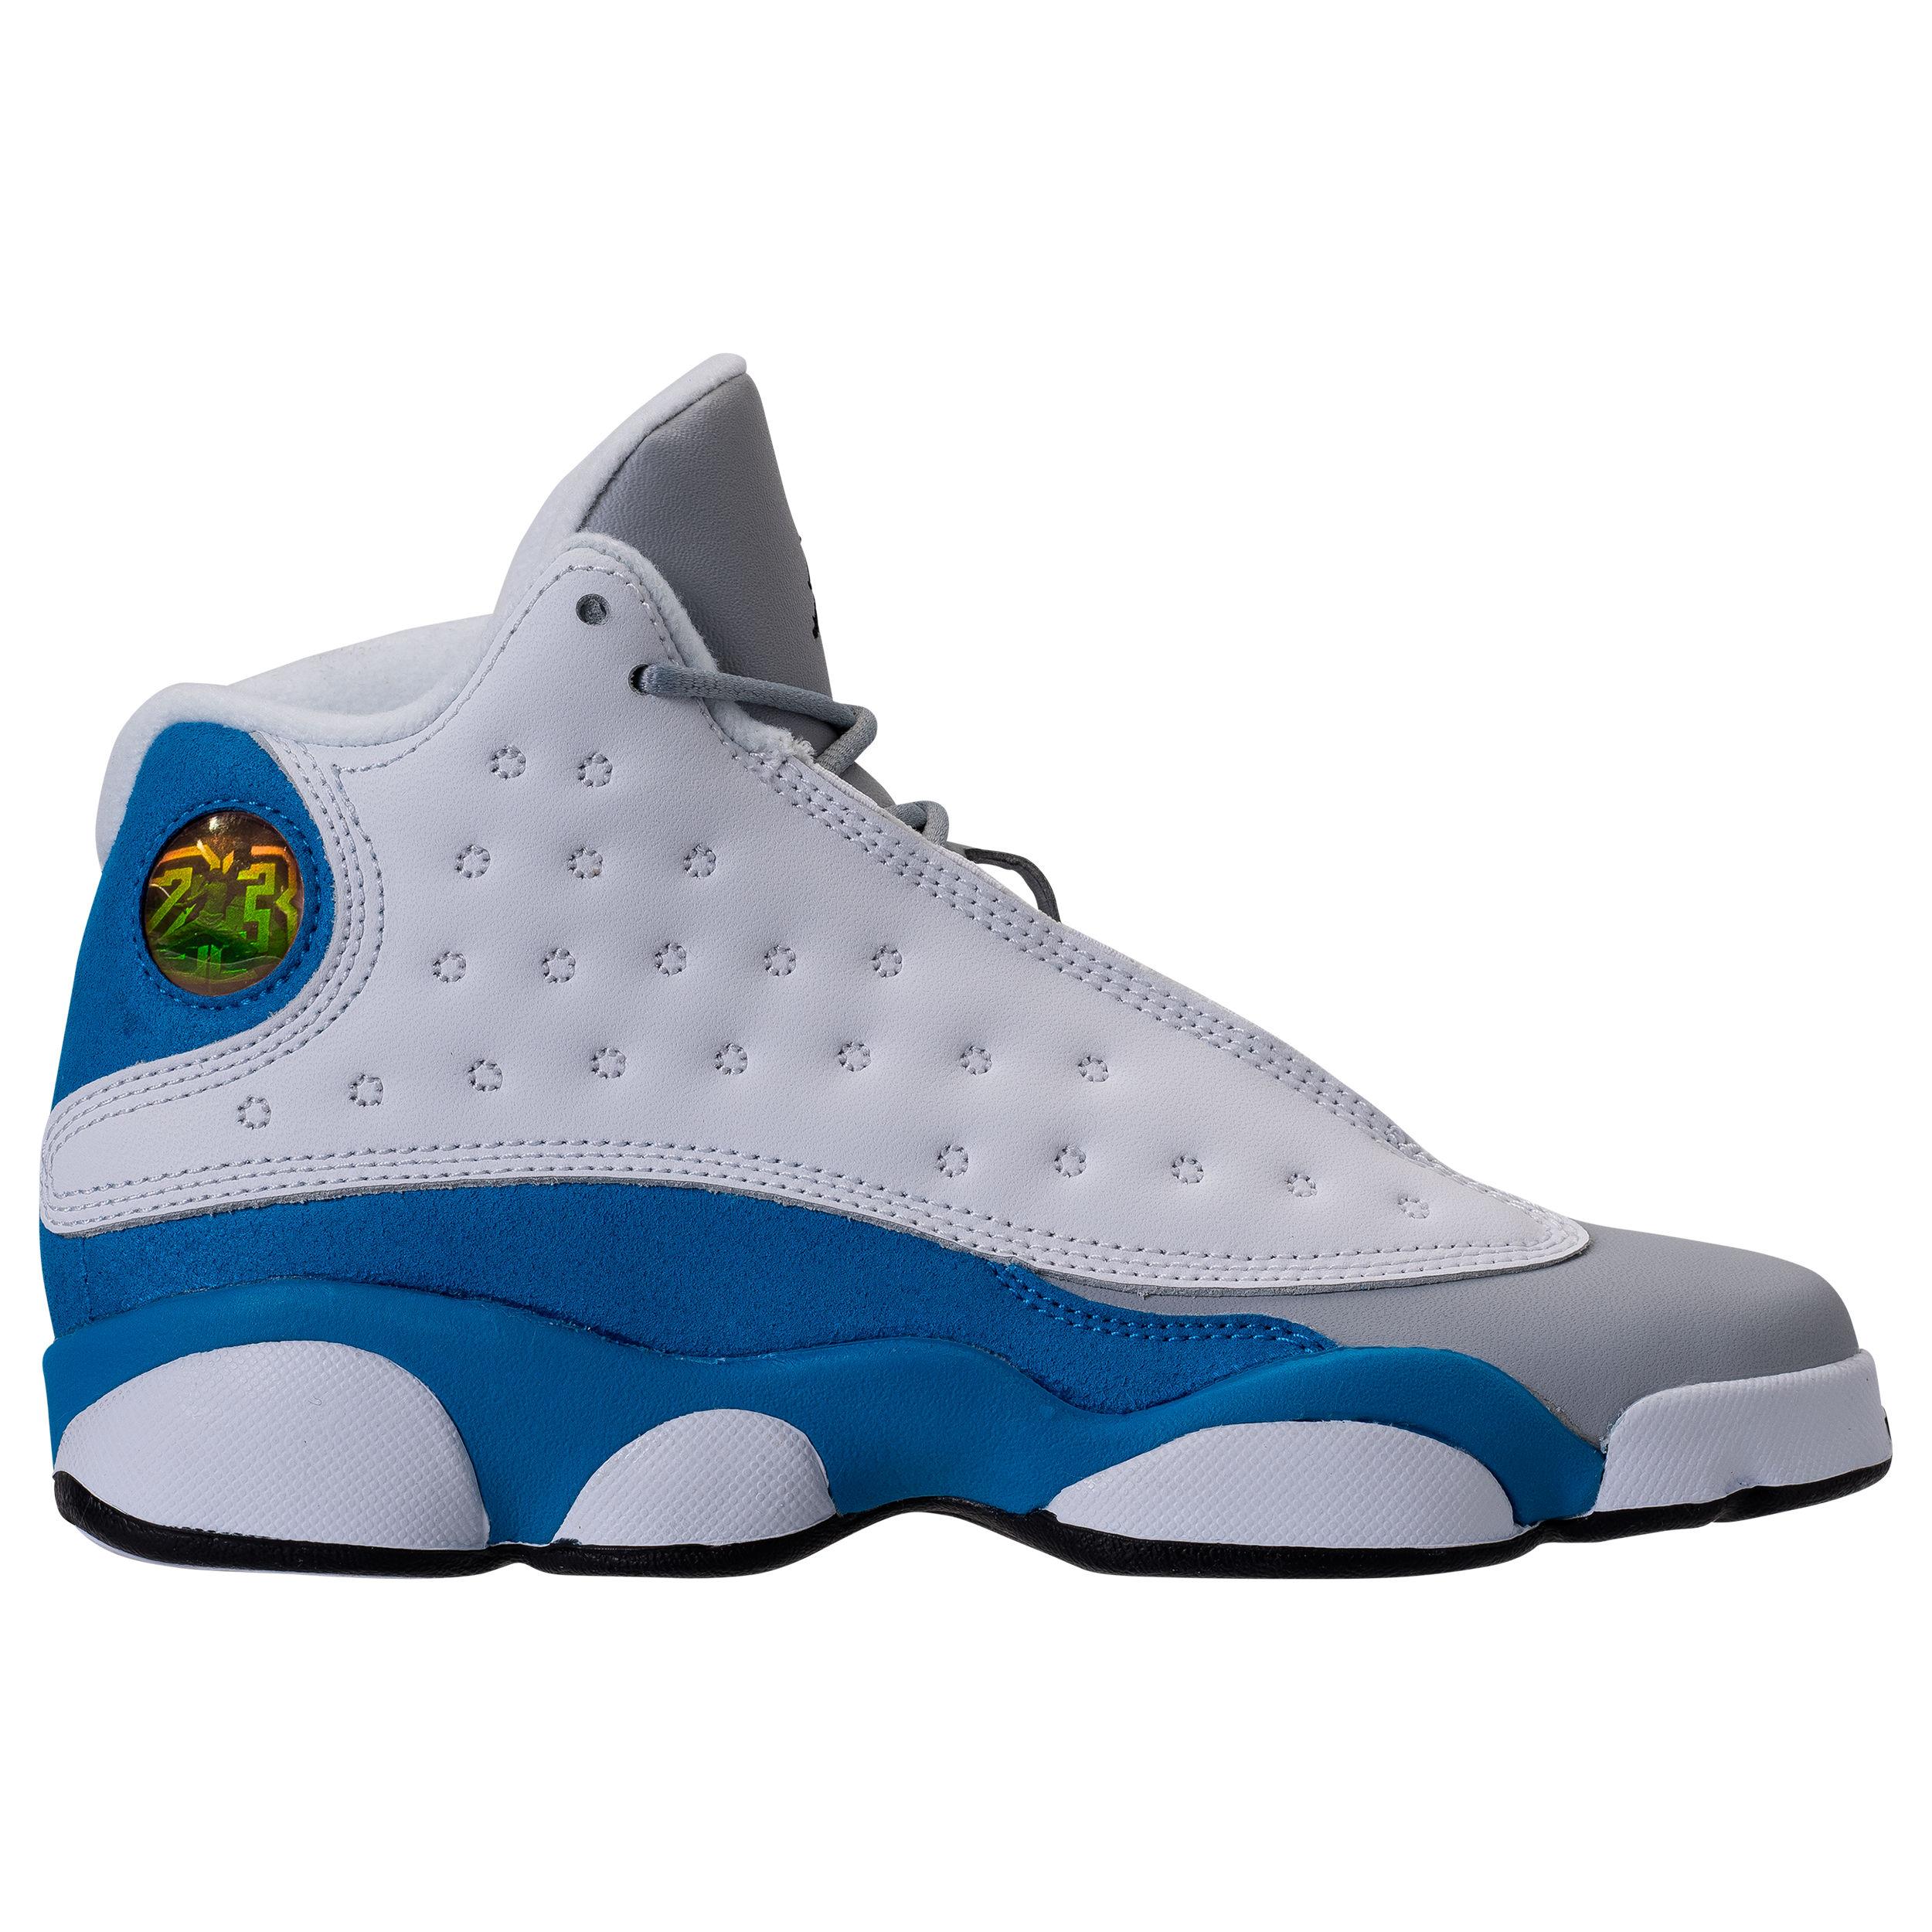 205089f21cc0 air jordan 13 italy blue 12 · Jordan Brand   Kicks On Court   Retro  Lifestyle ...